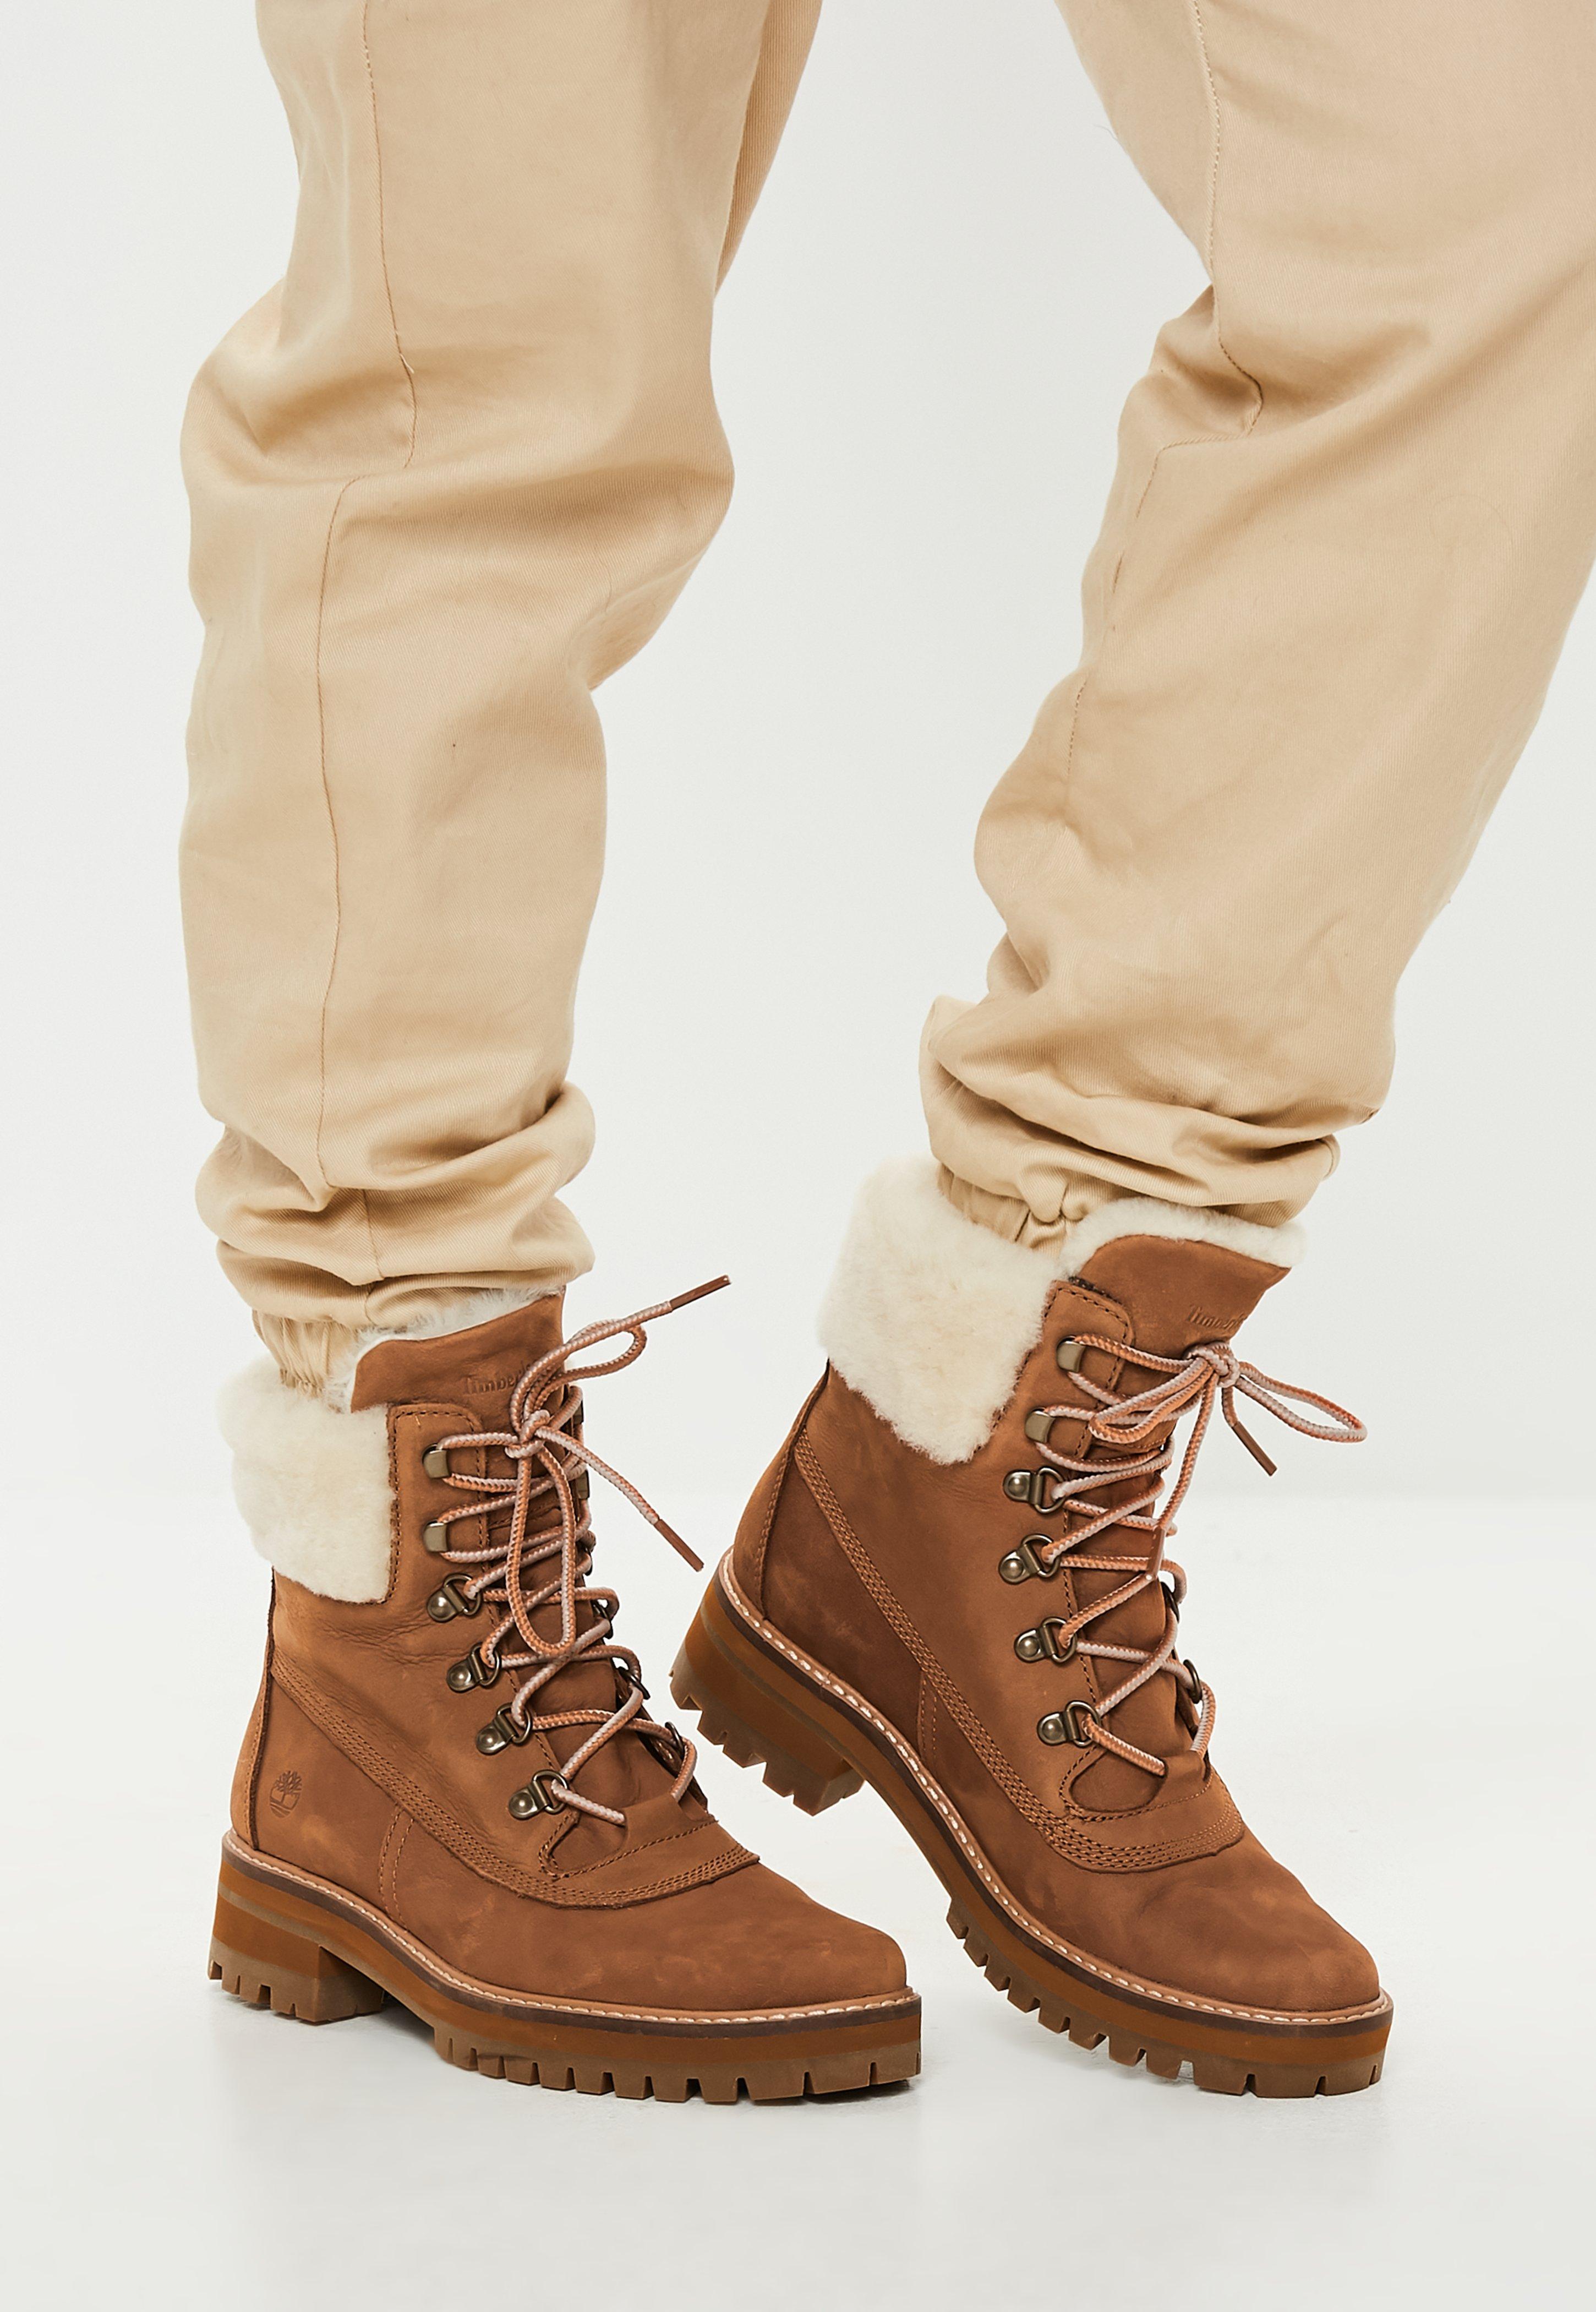 0b67079db1d Missguided. Women s Timberland Rust Courmayeur Valley Shearling Boots